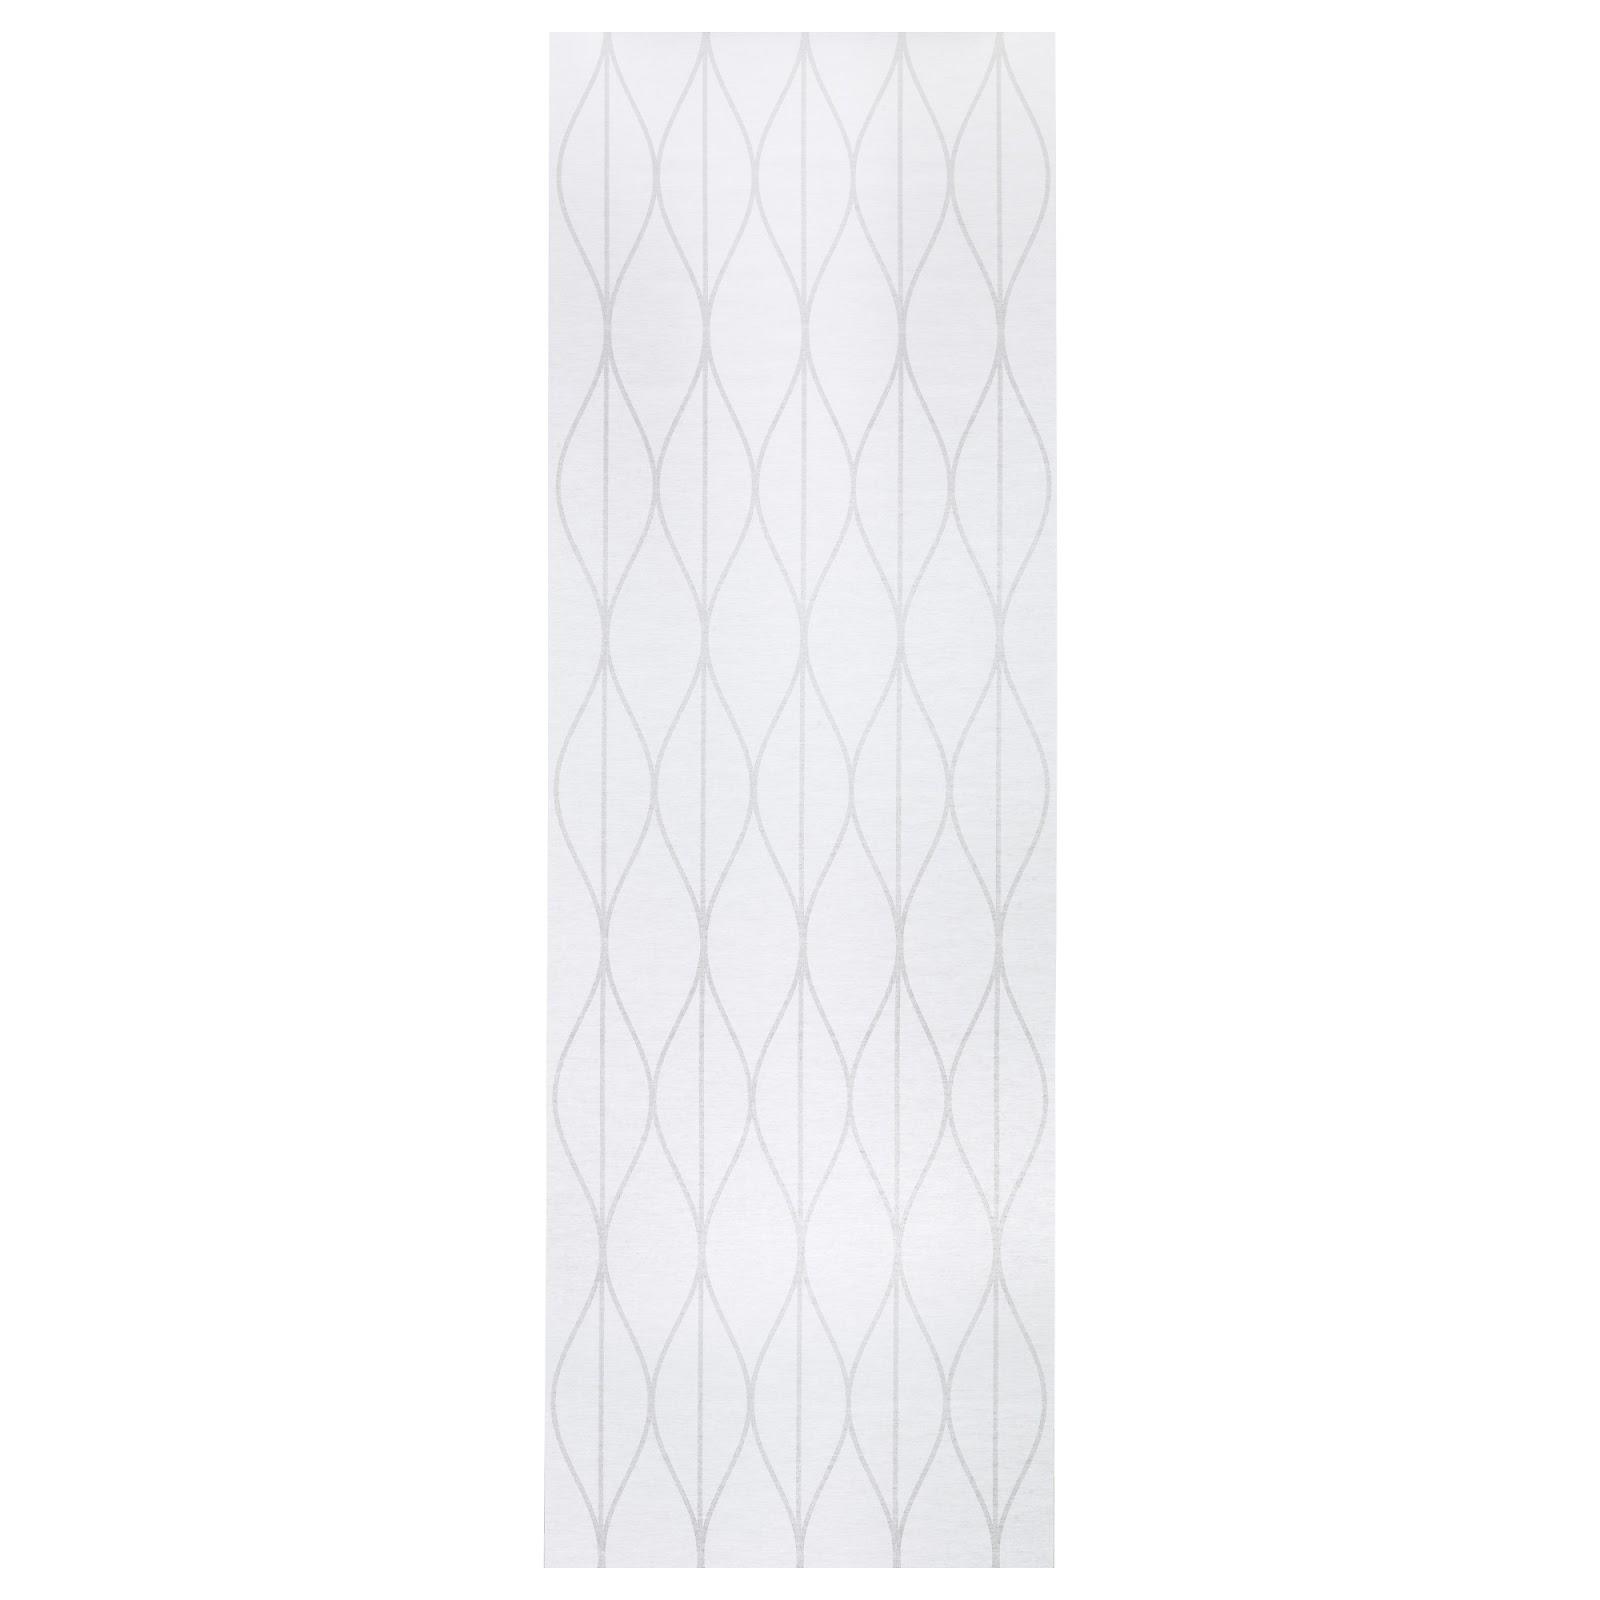 Double Curtain Rod Bay Window Brackets Home Depot Ikea Brushed Nickel